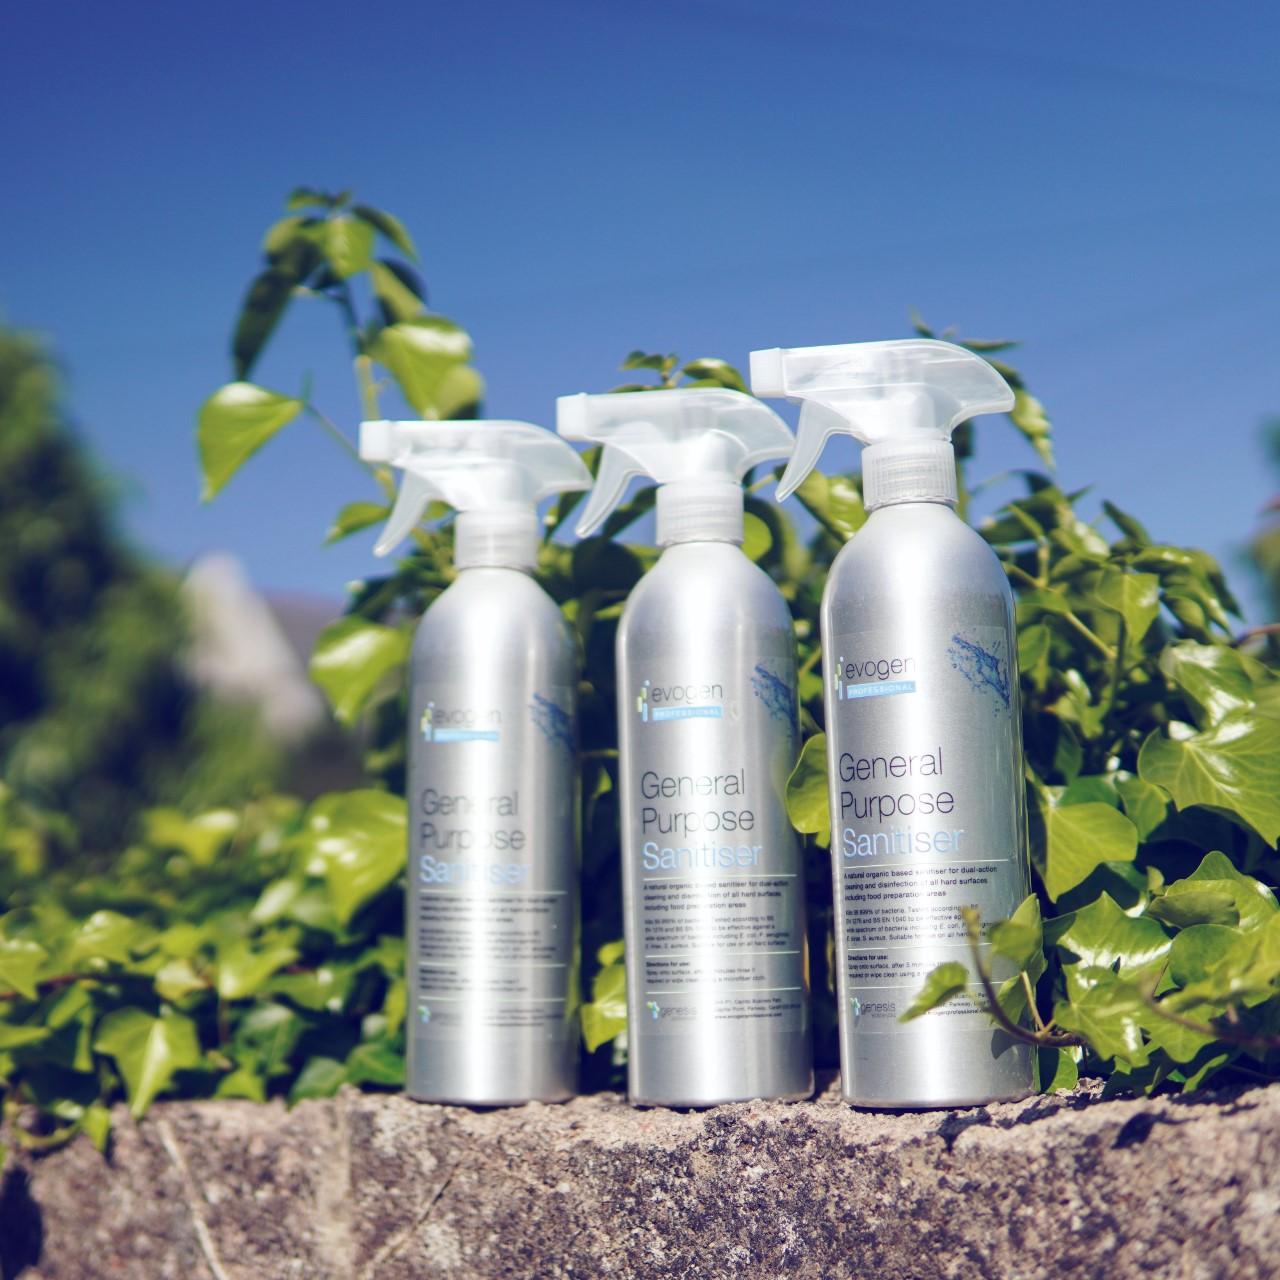 General Purpose Sanitiser - anti-viral, anti-bacterial sanitiser to prevent viruses - metal bottles